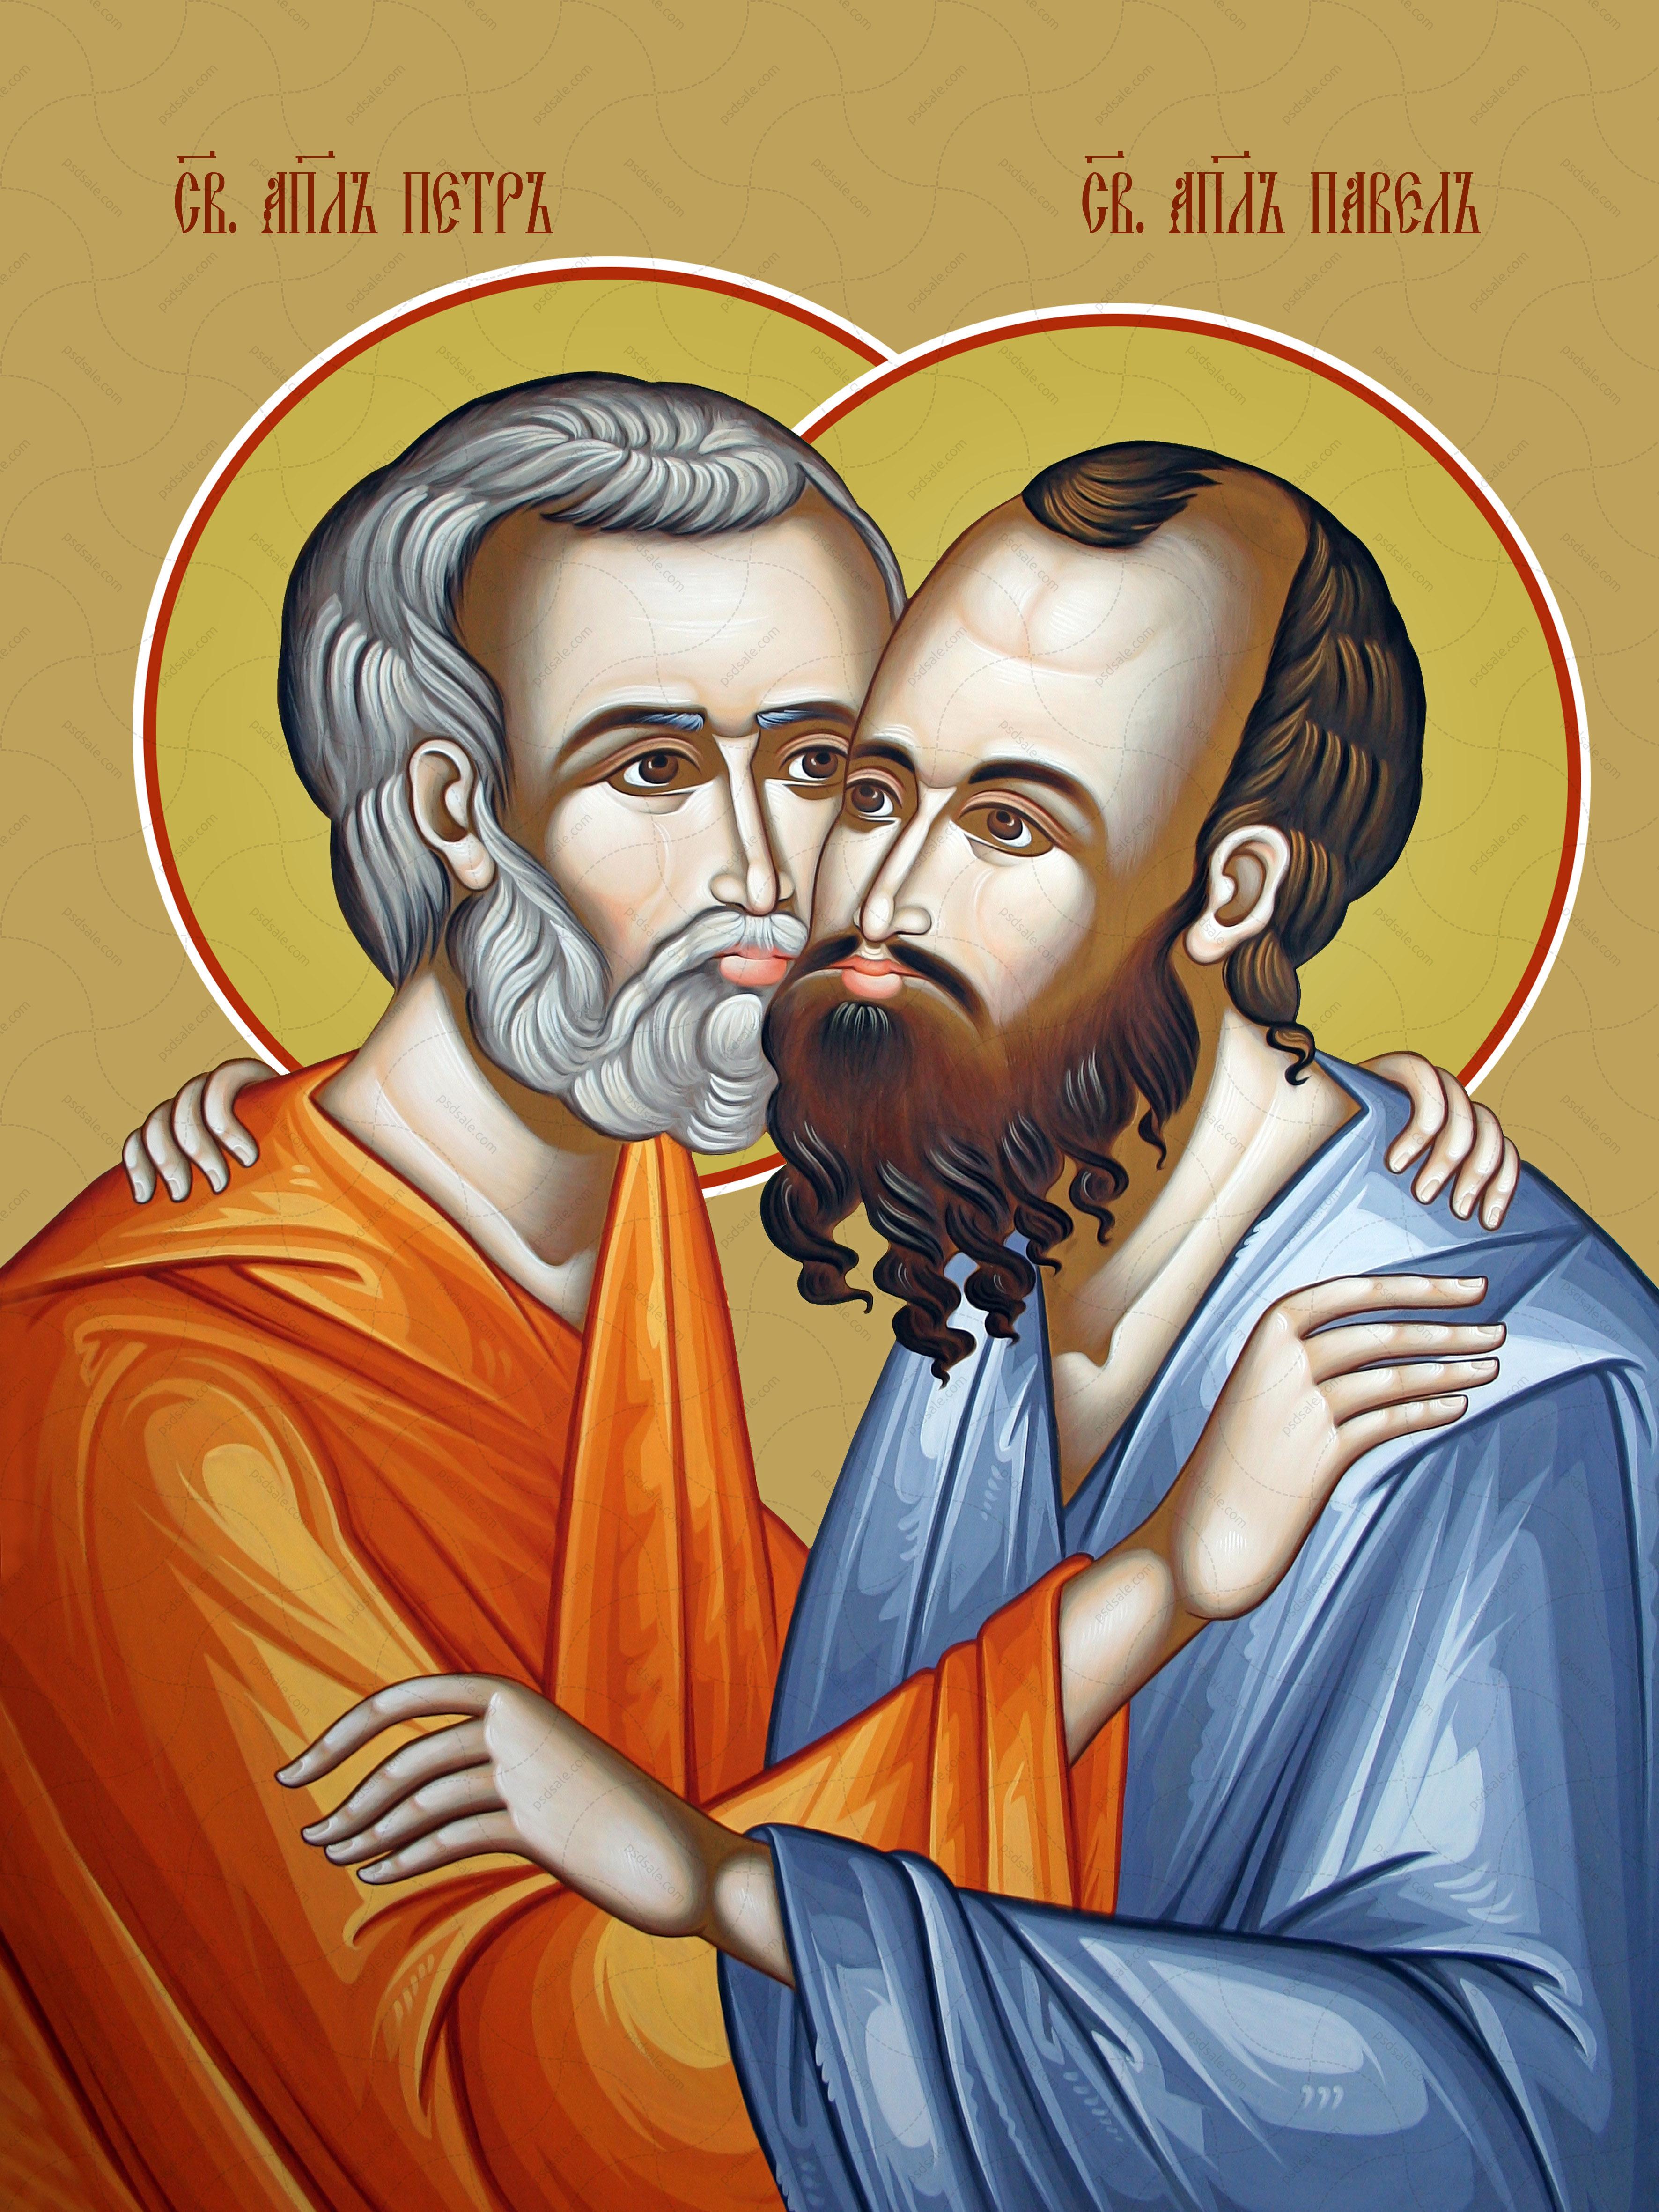 Павел и Петр, святой апостол